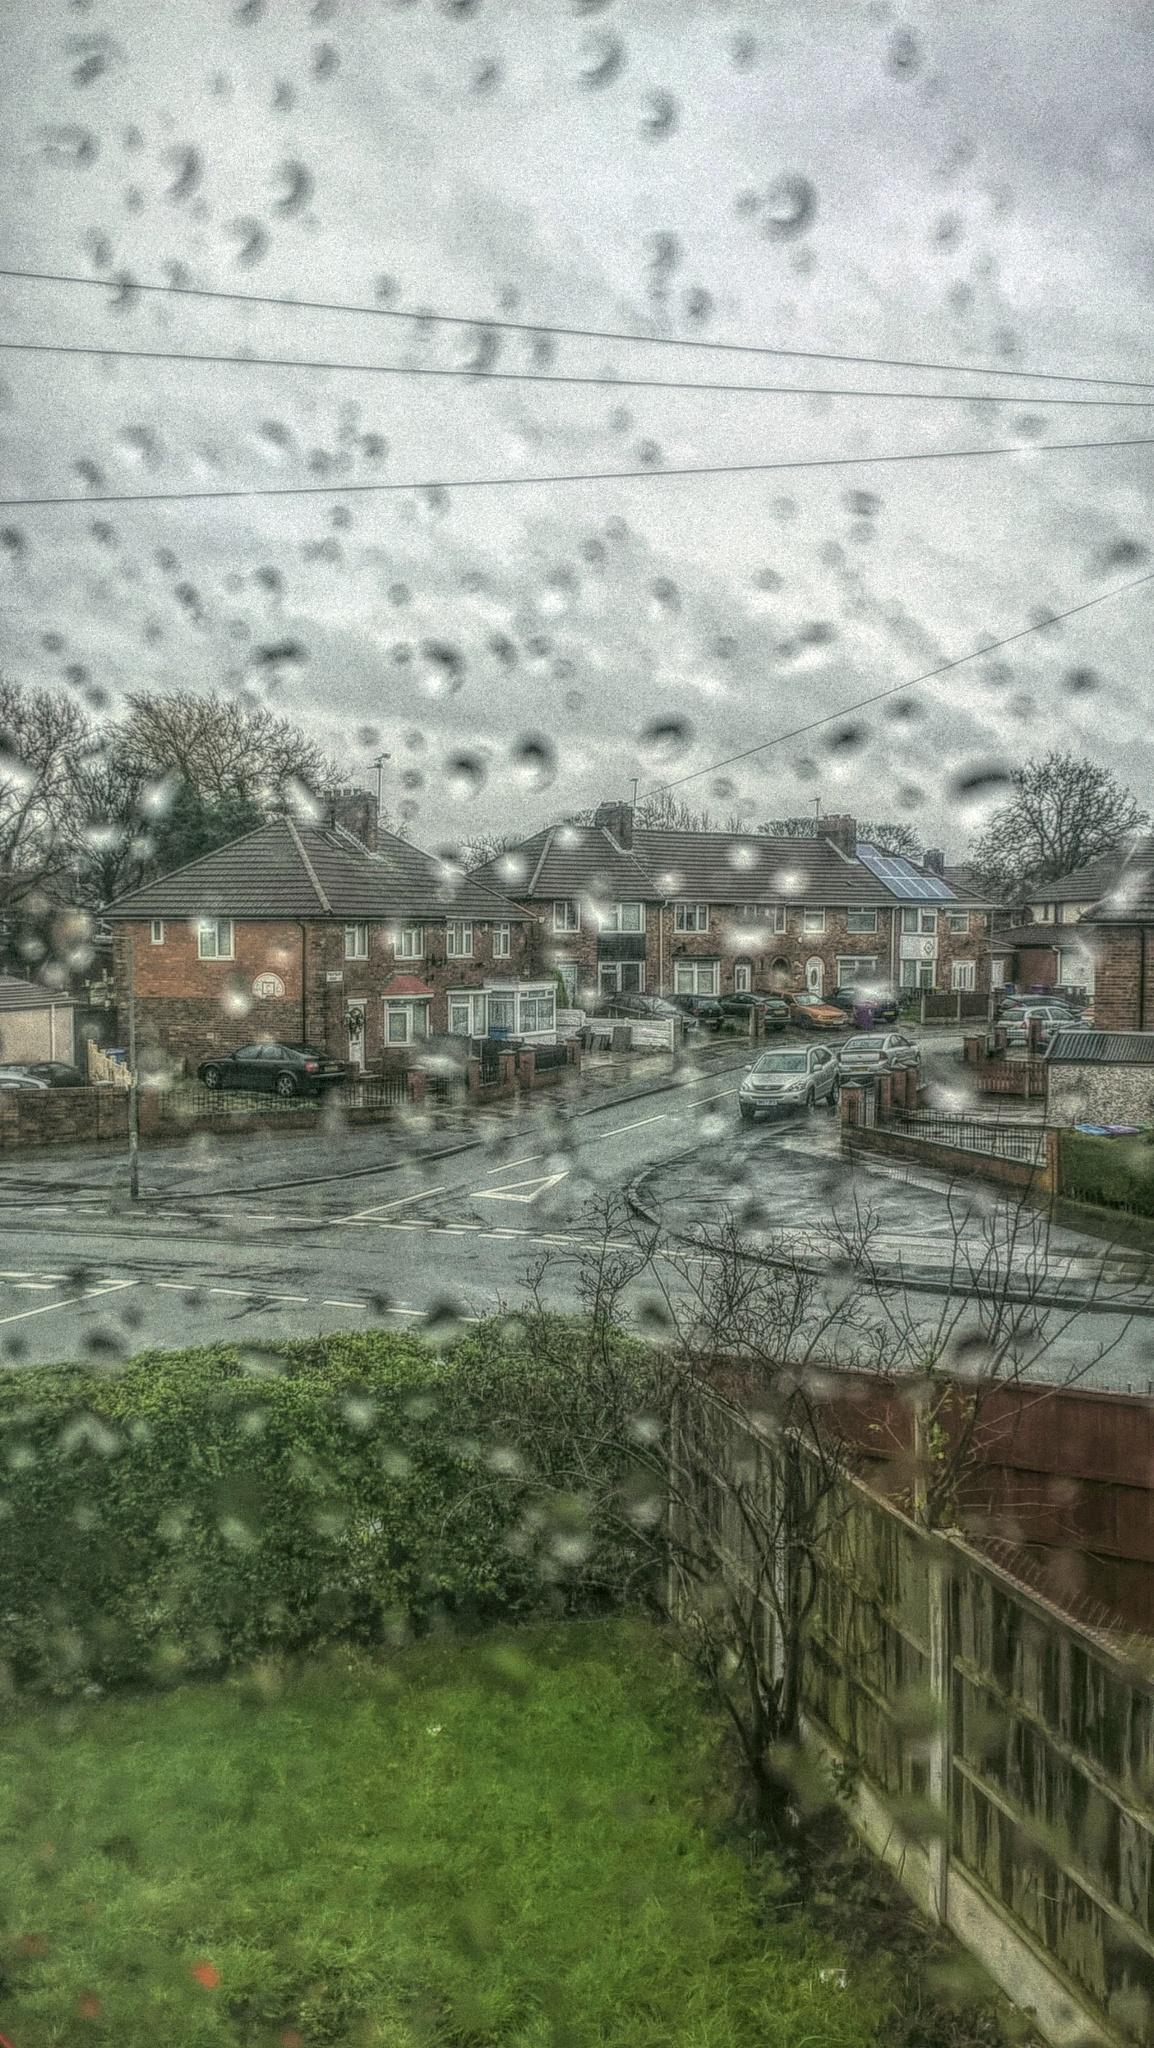 Rain by Laconic Photo